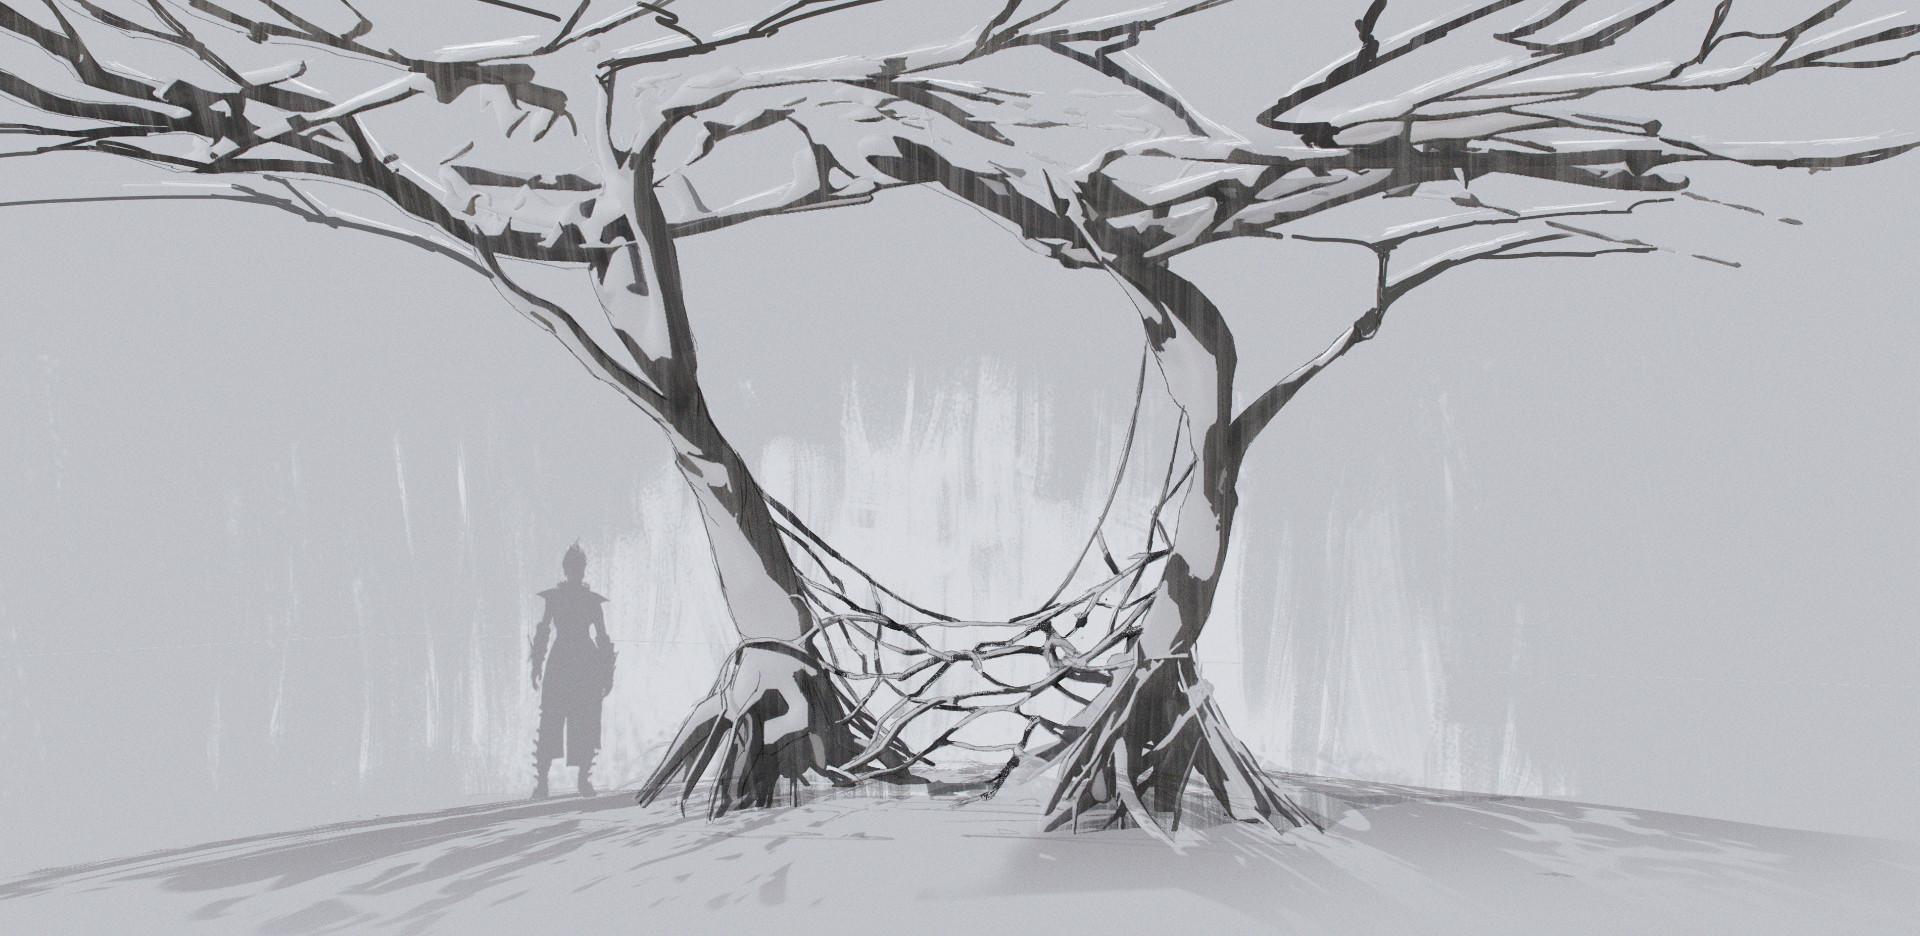 Patrik rosander athel yenlui undergrowth tree vines